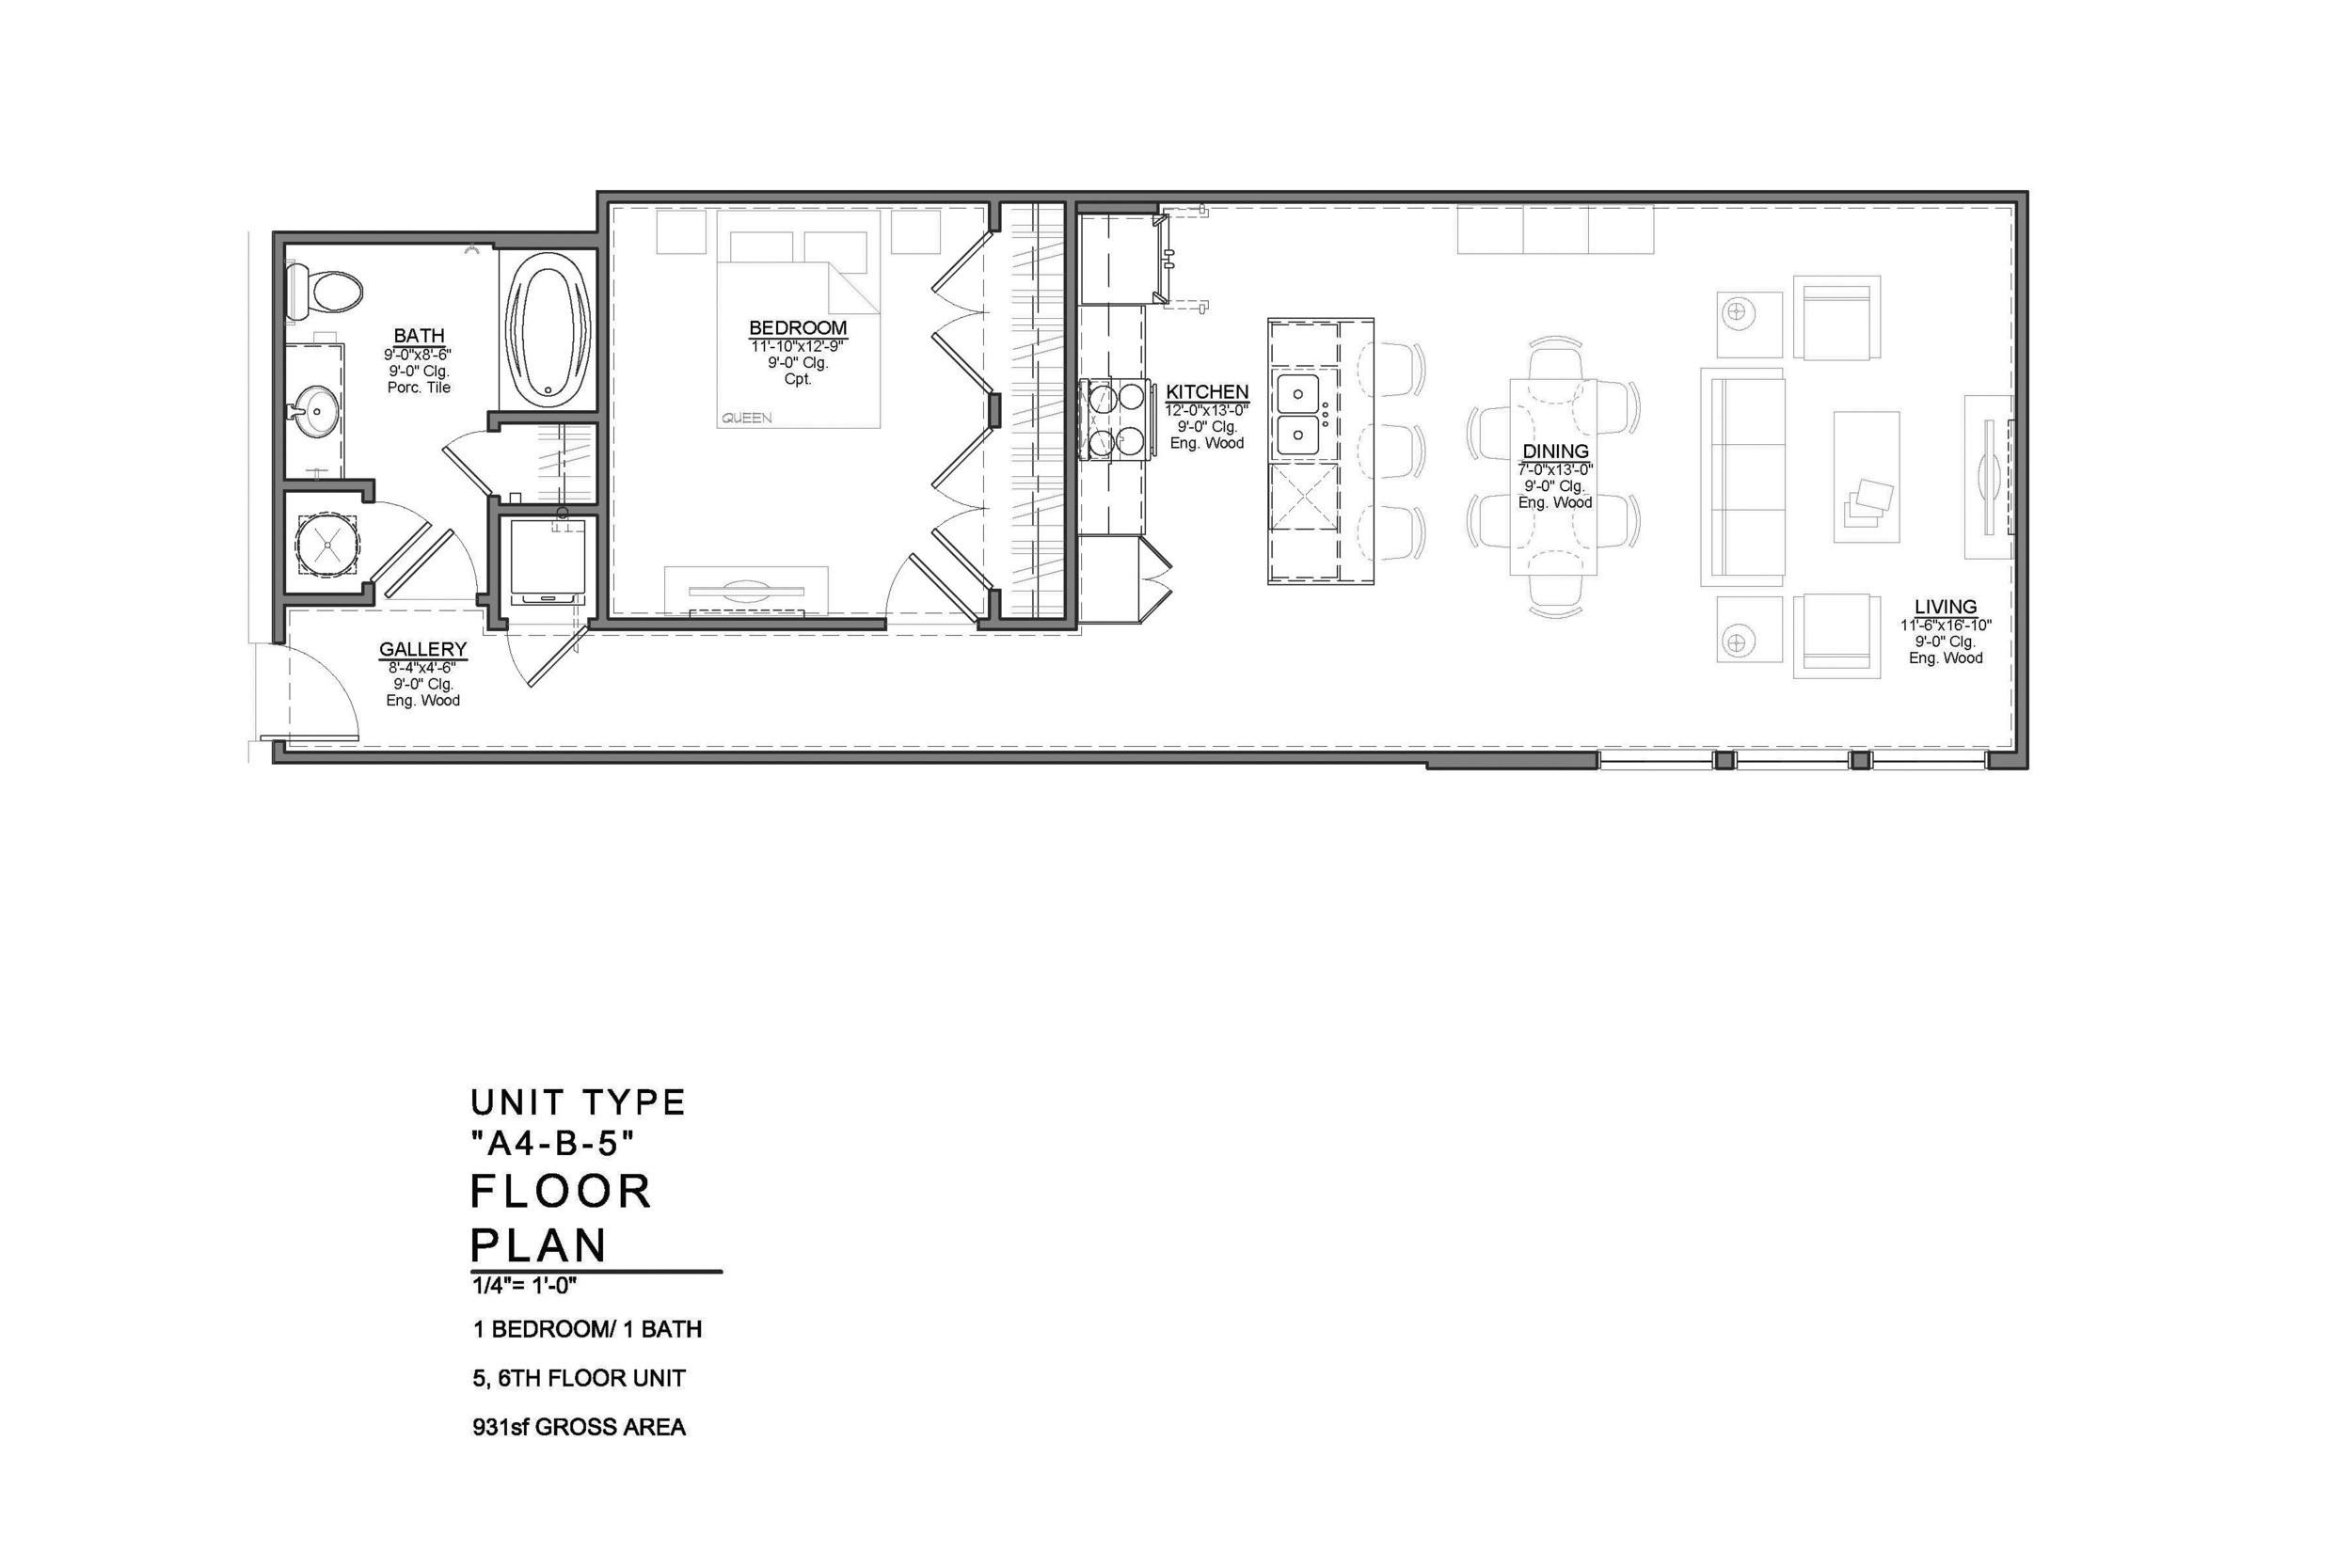 A4-B-5 FLOOR PLAN: 1 BEDROOM / 1 BATH